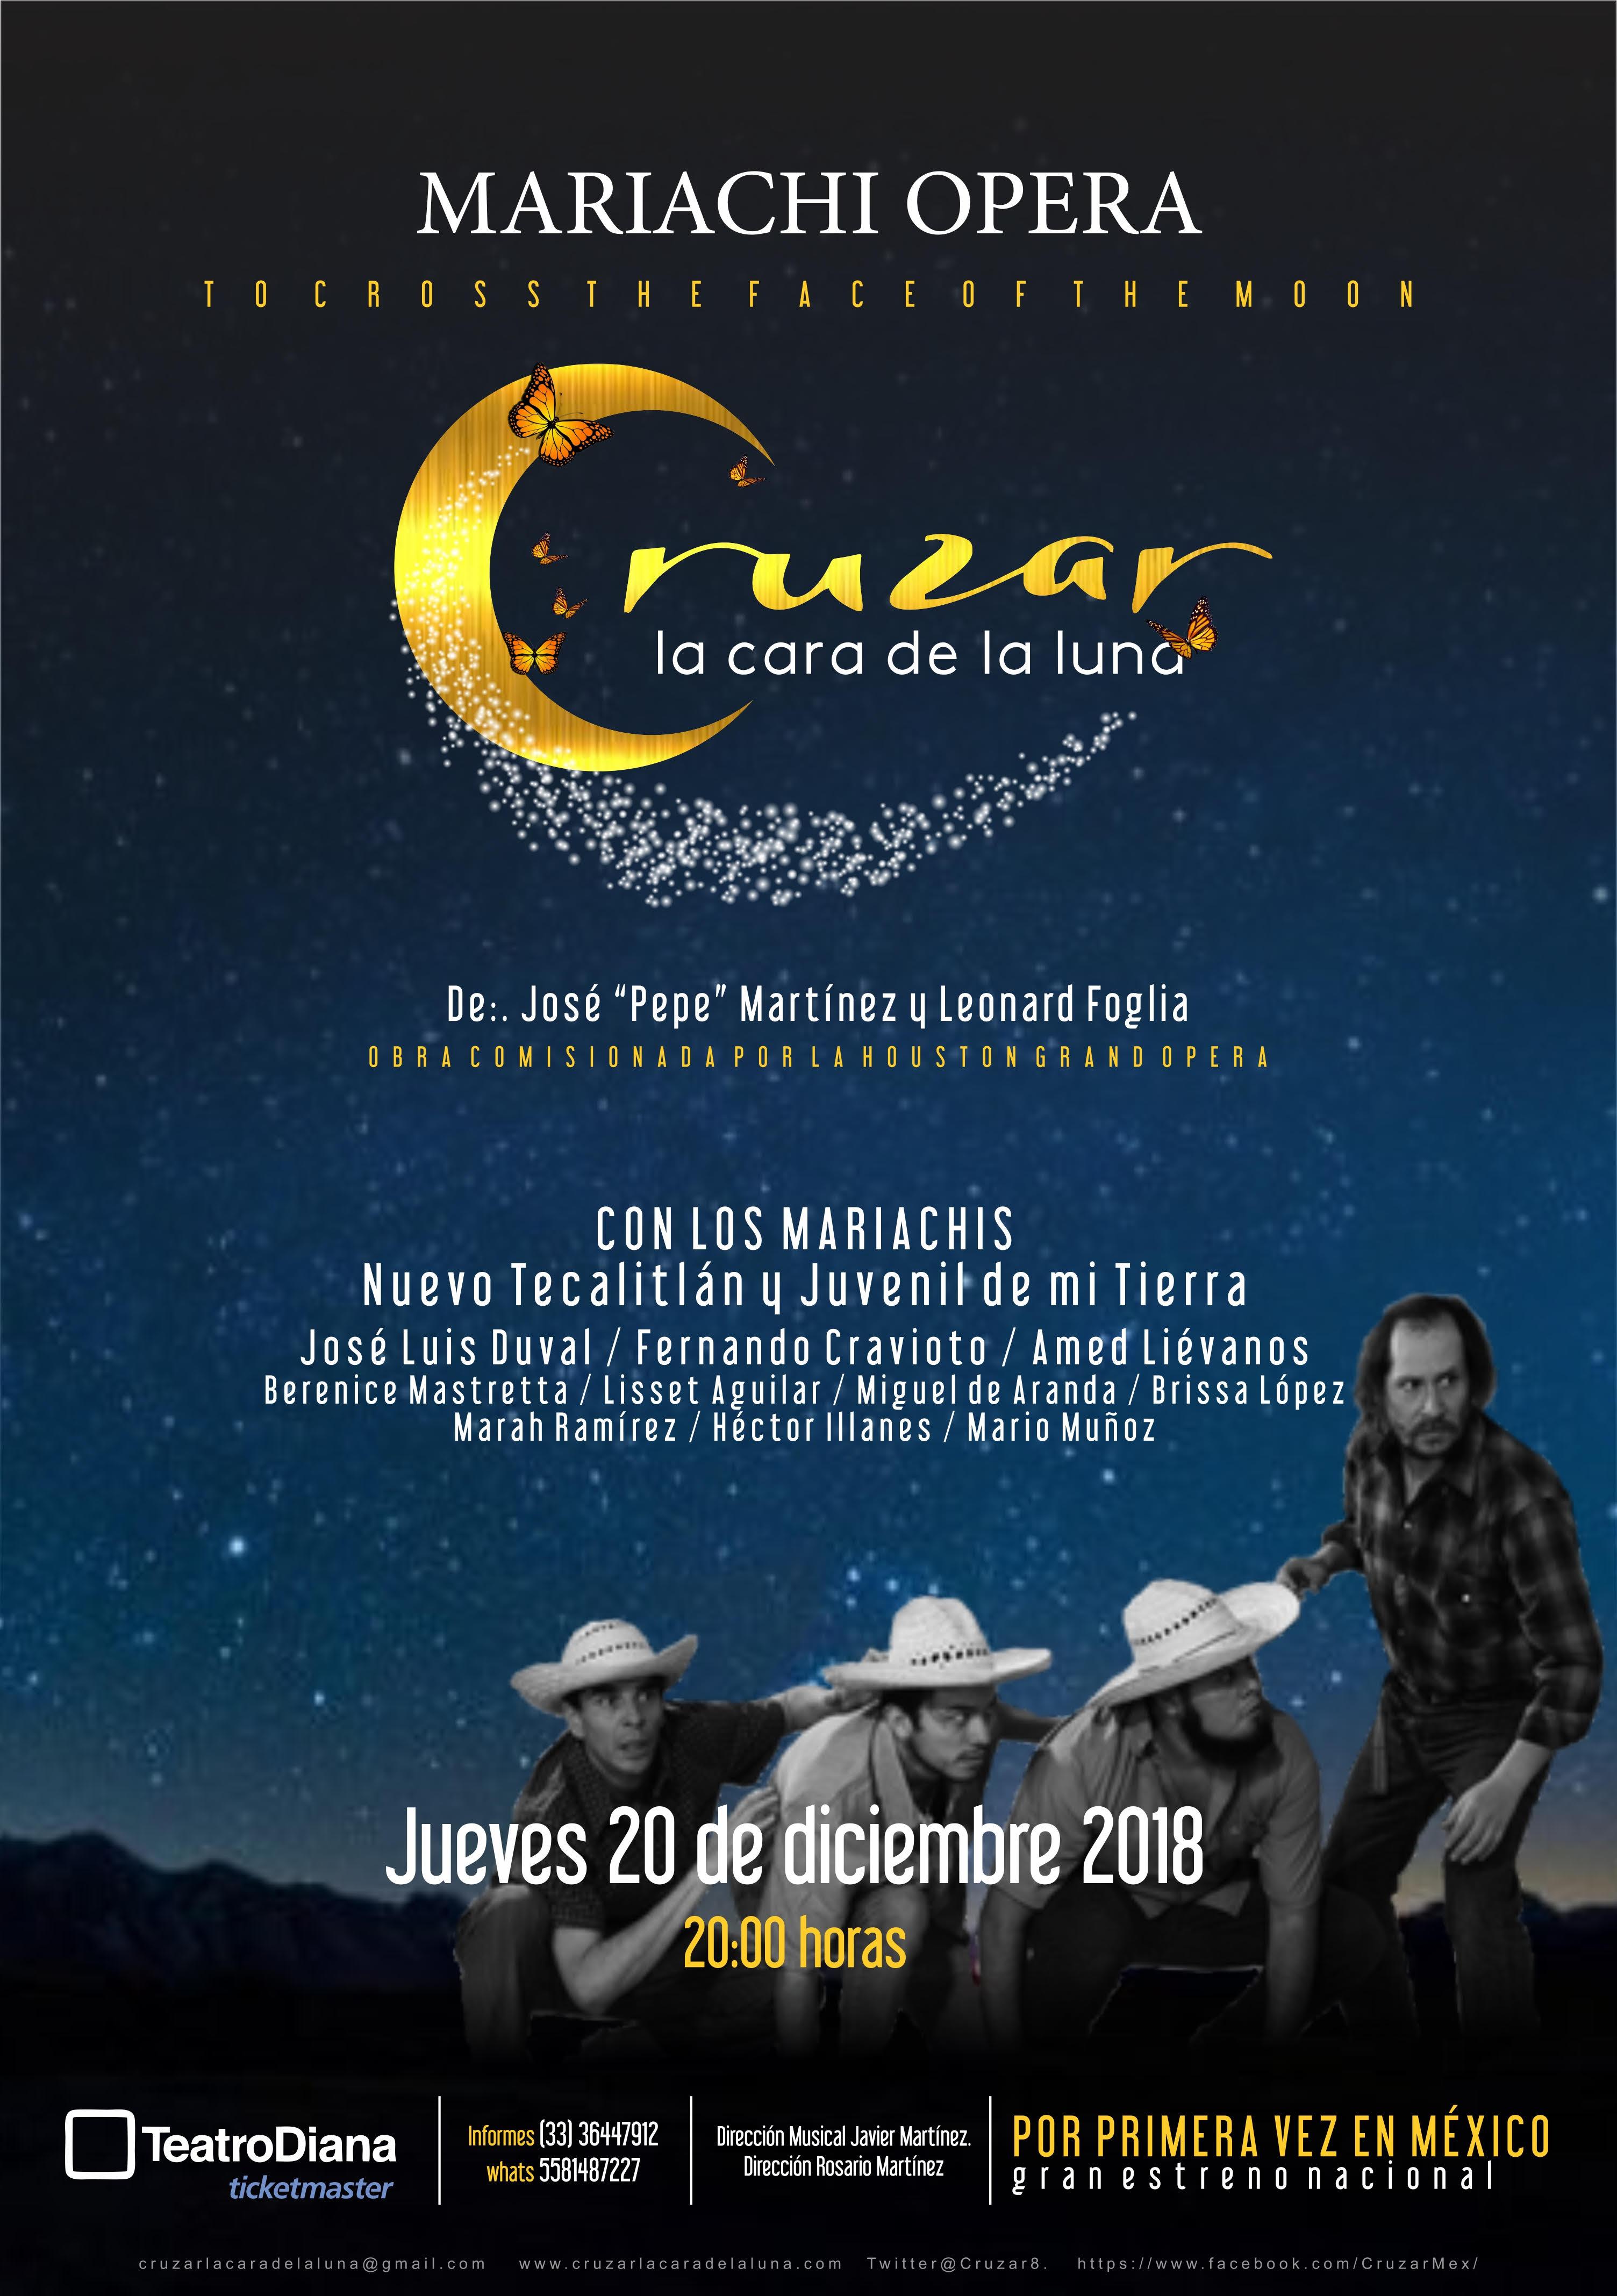 """Cruzar la cara de la luna"" Ópera-Mariachi / Teatro Diana"